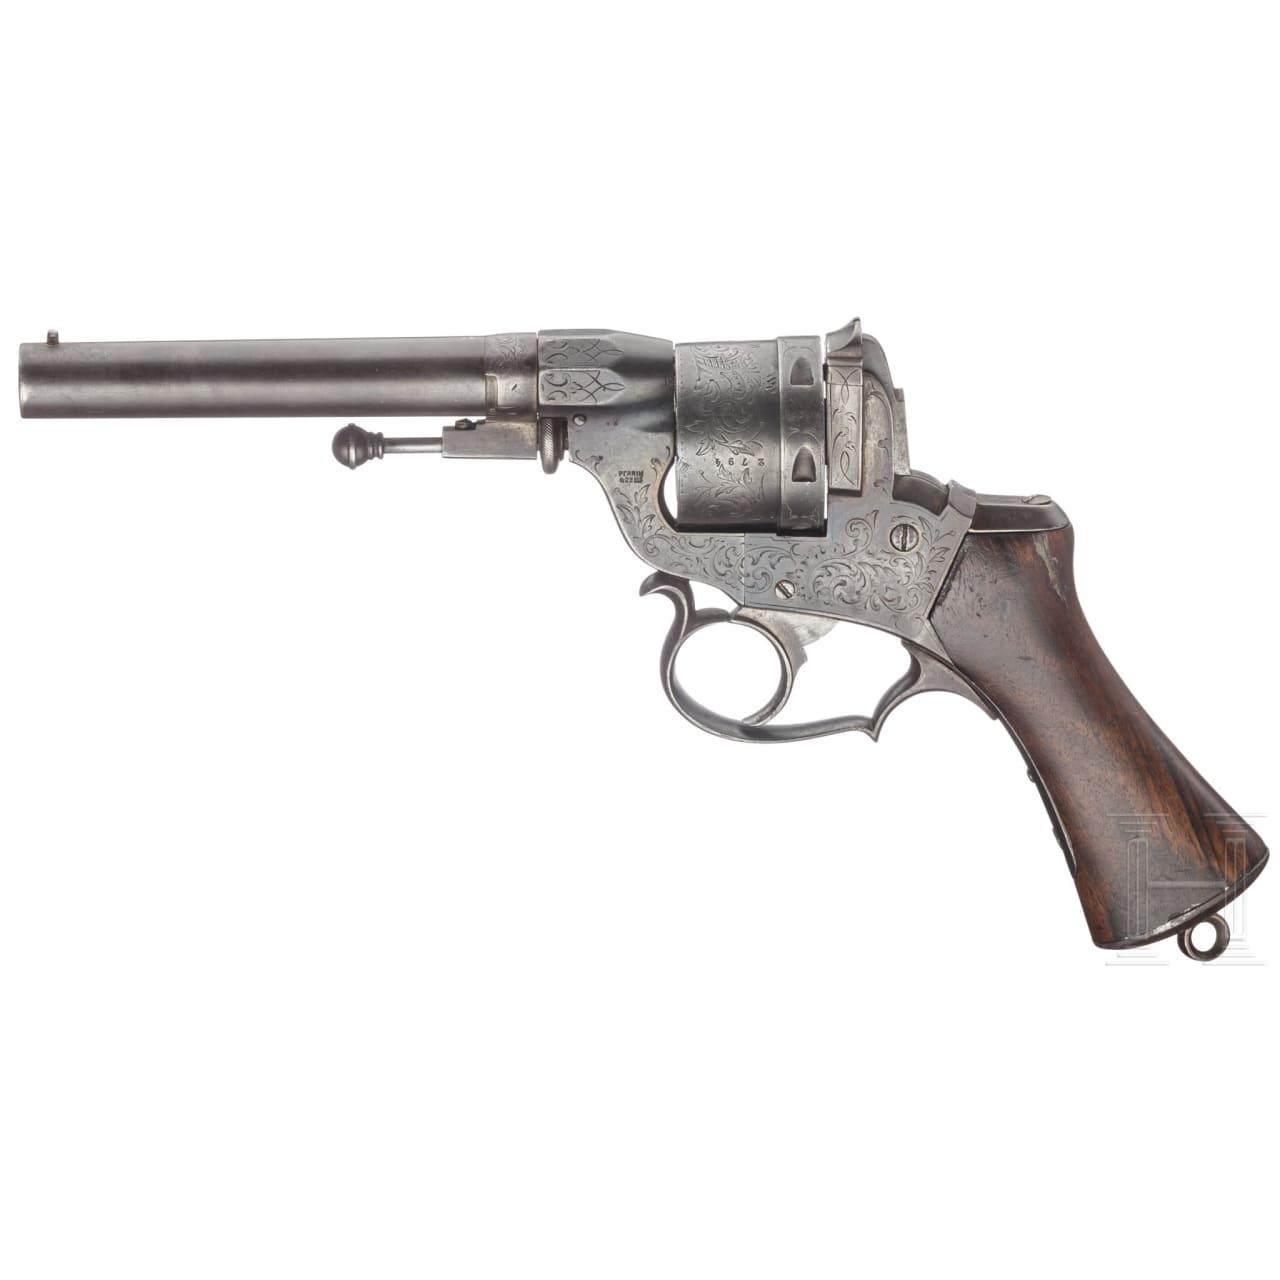 Revolver Perrin Modell 1859, 2. Ausführung